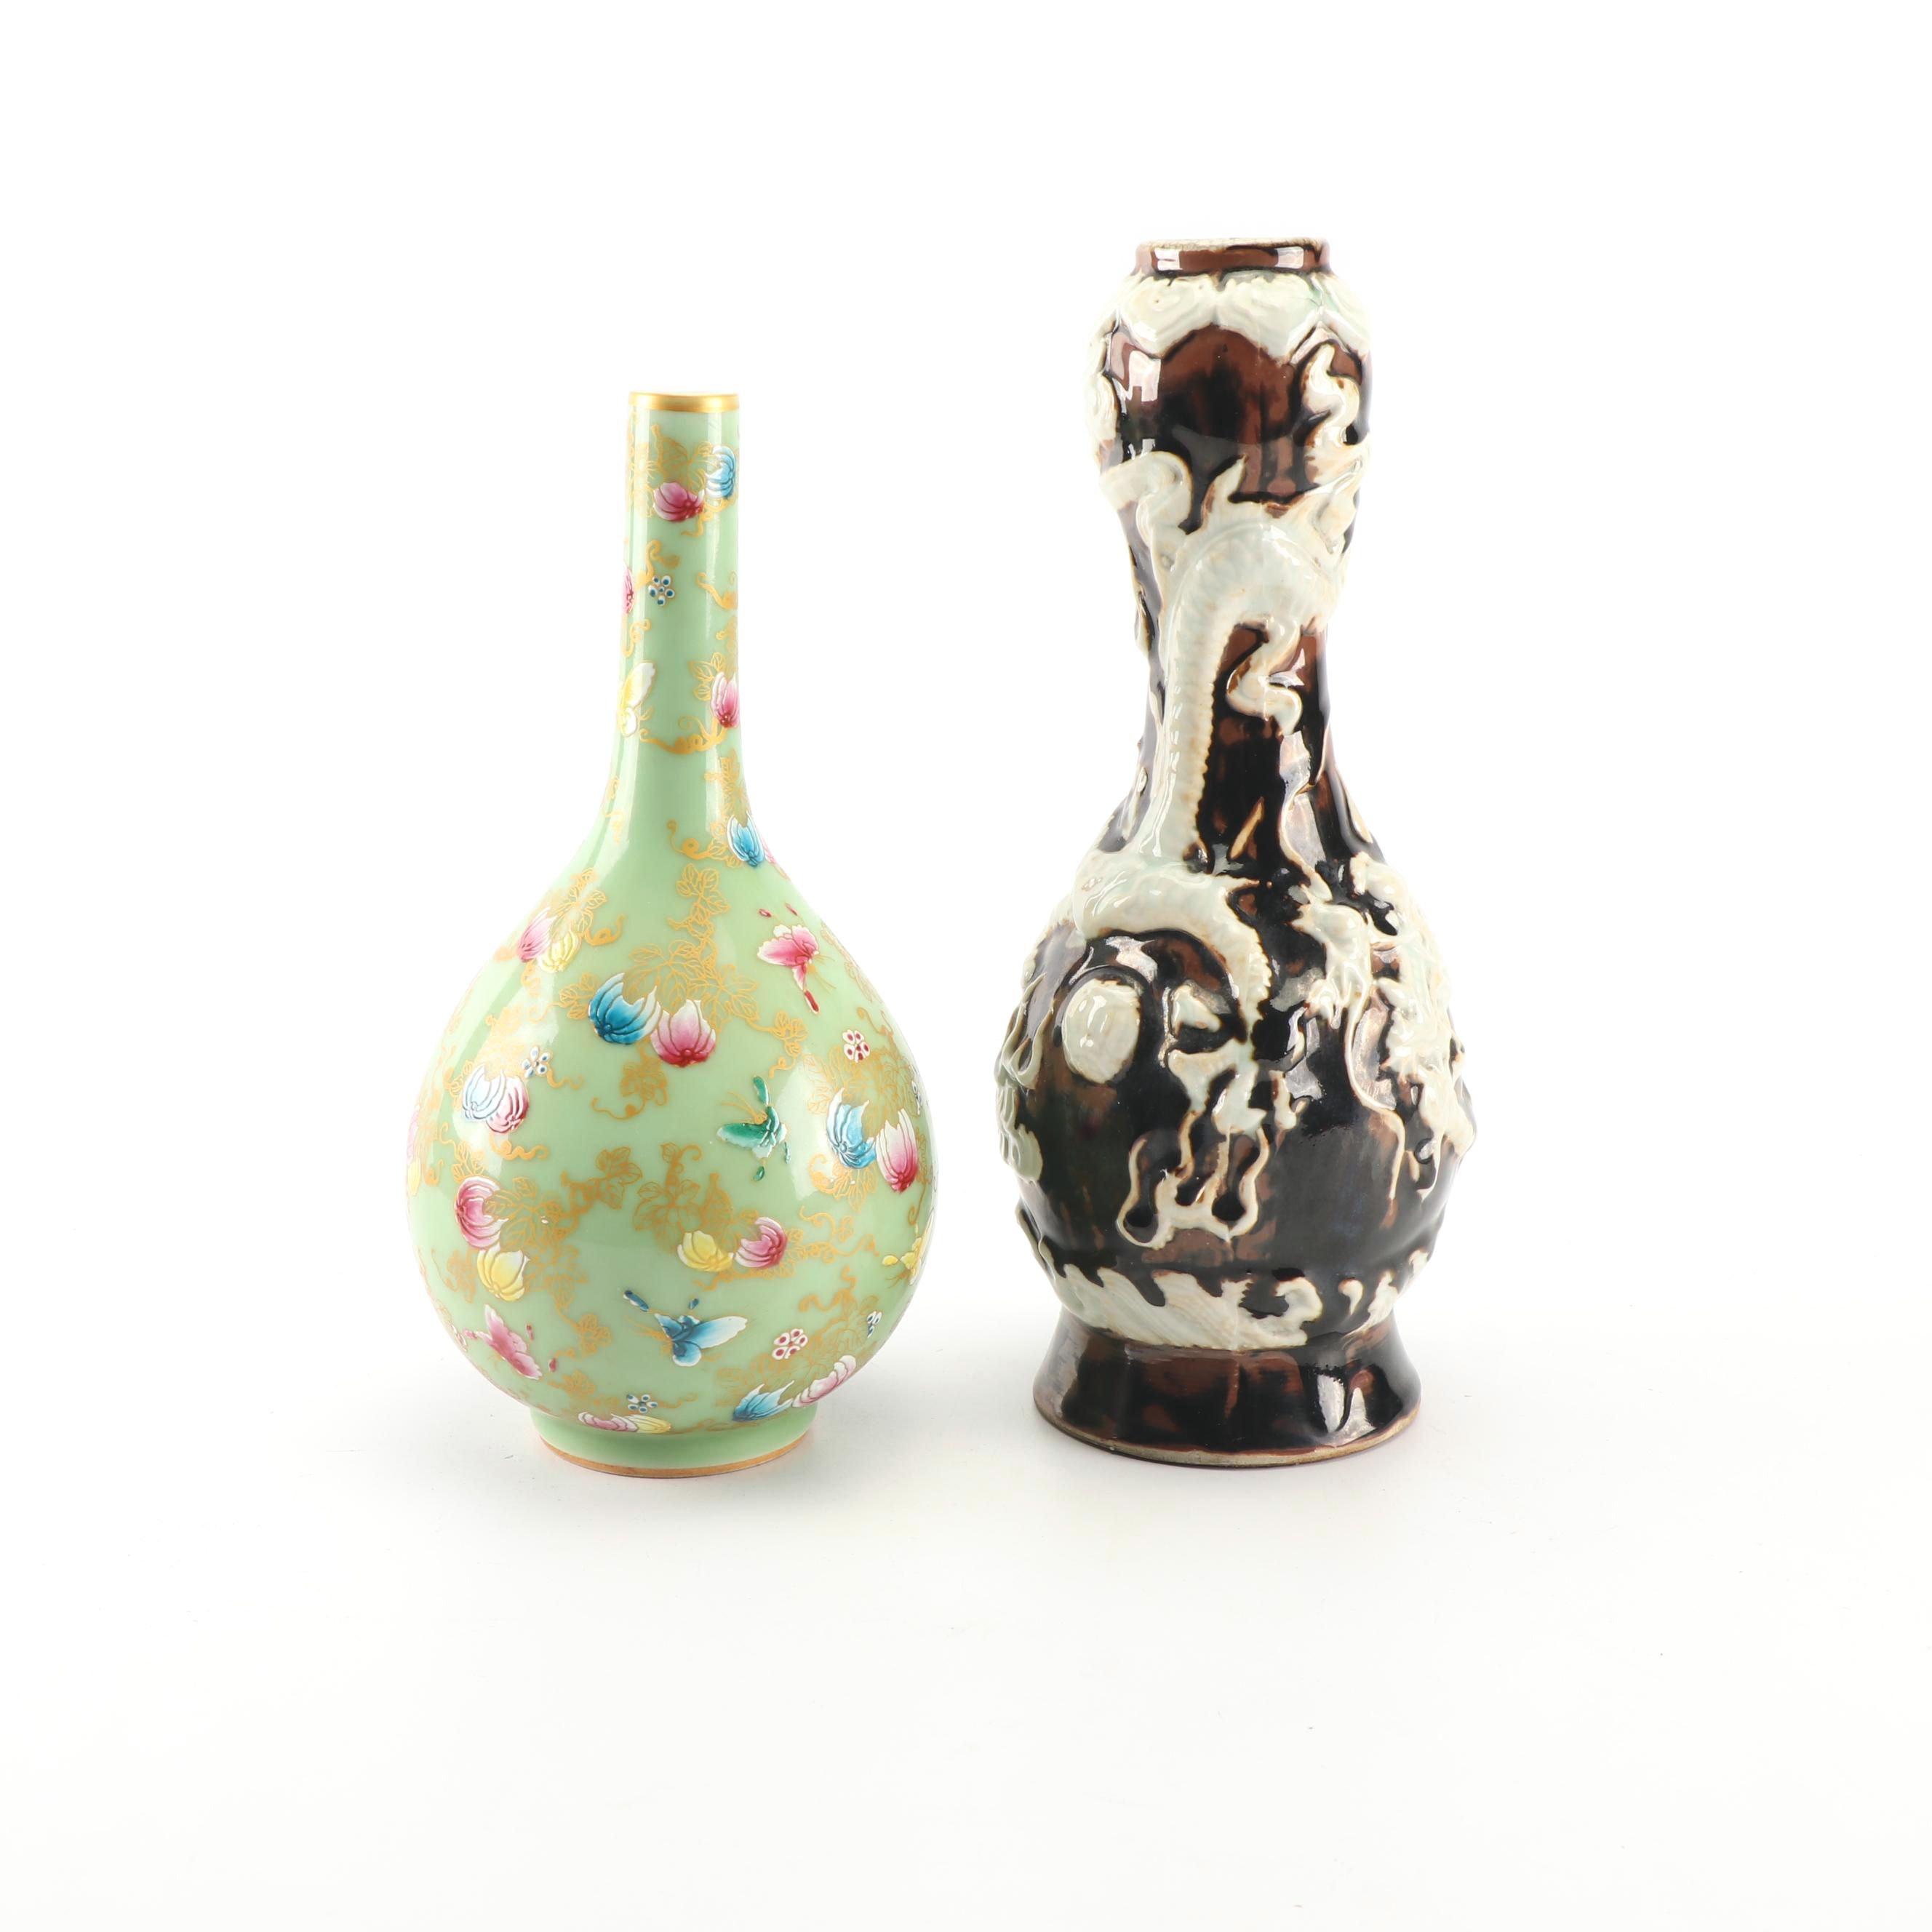 Chinese High Relief Dragon Vase and Celadon Glazed Vase with Overglaze Enamel